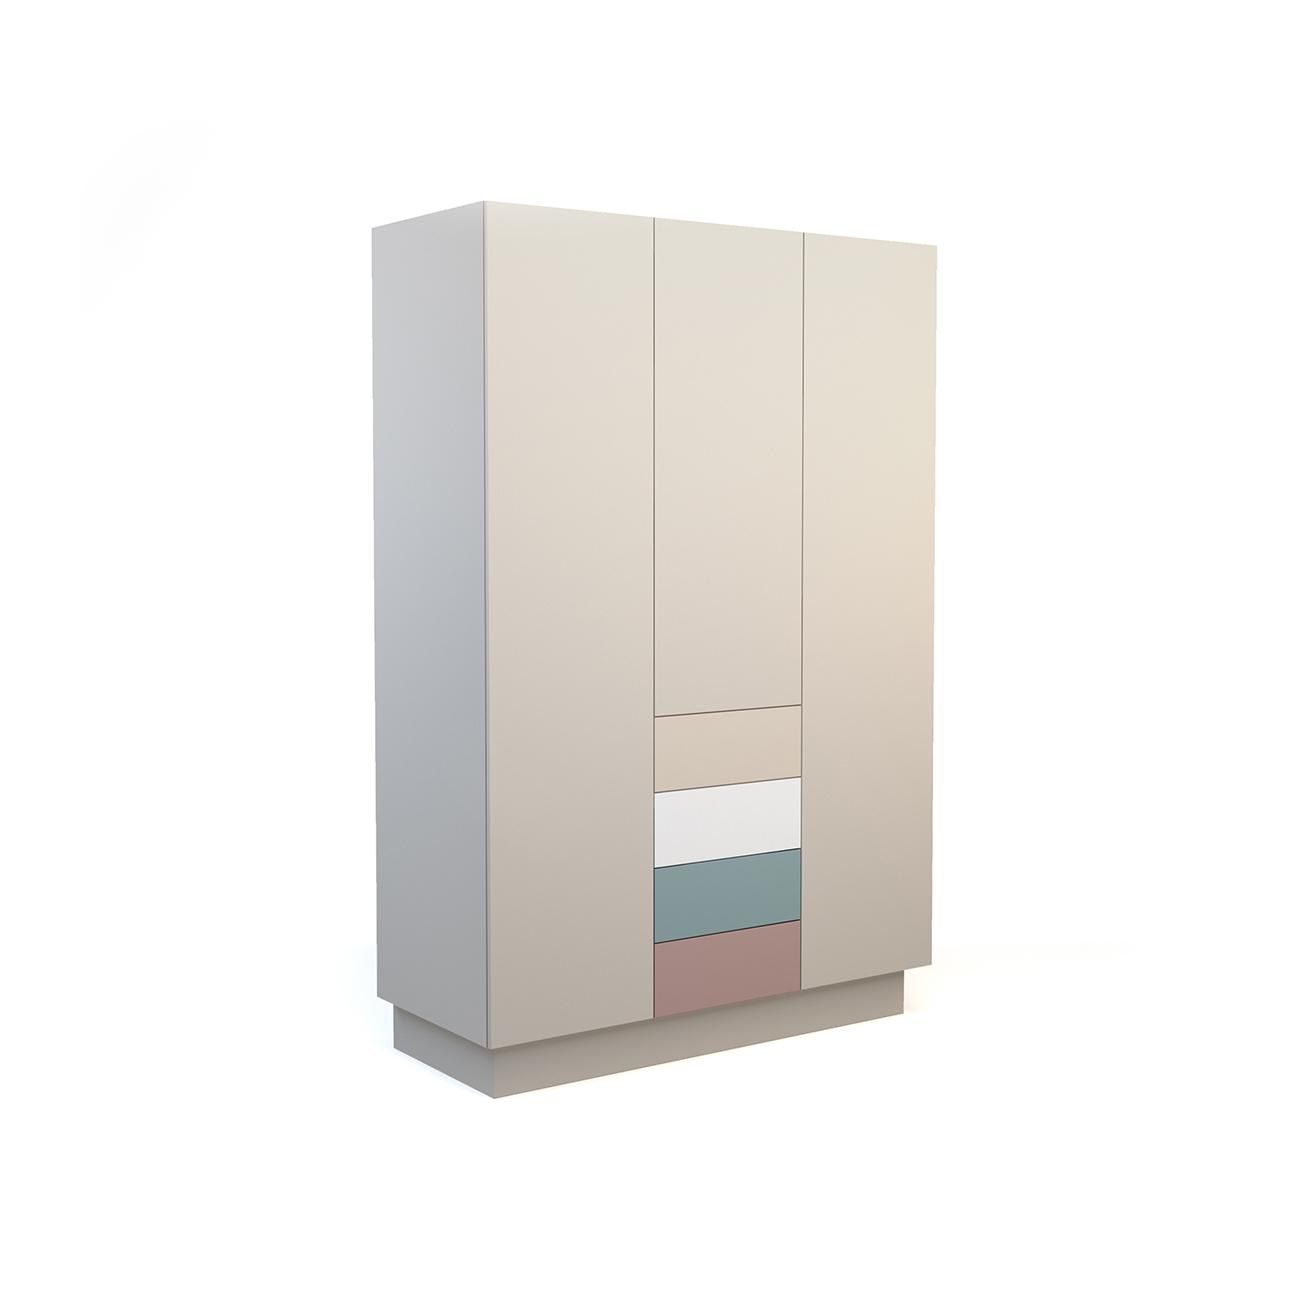 Шкаф galata soft (olhause) серый 150x225x60 см.